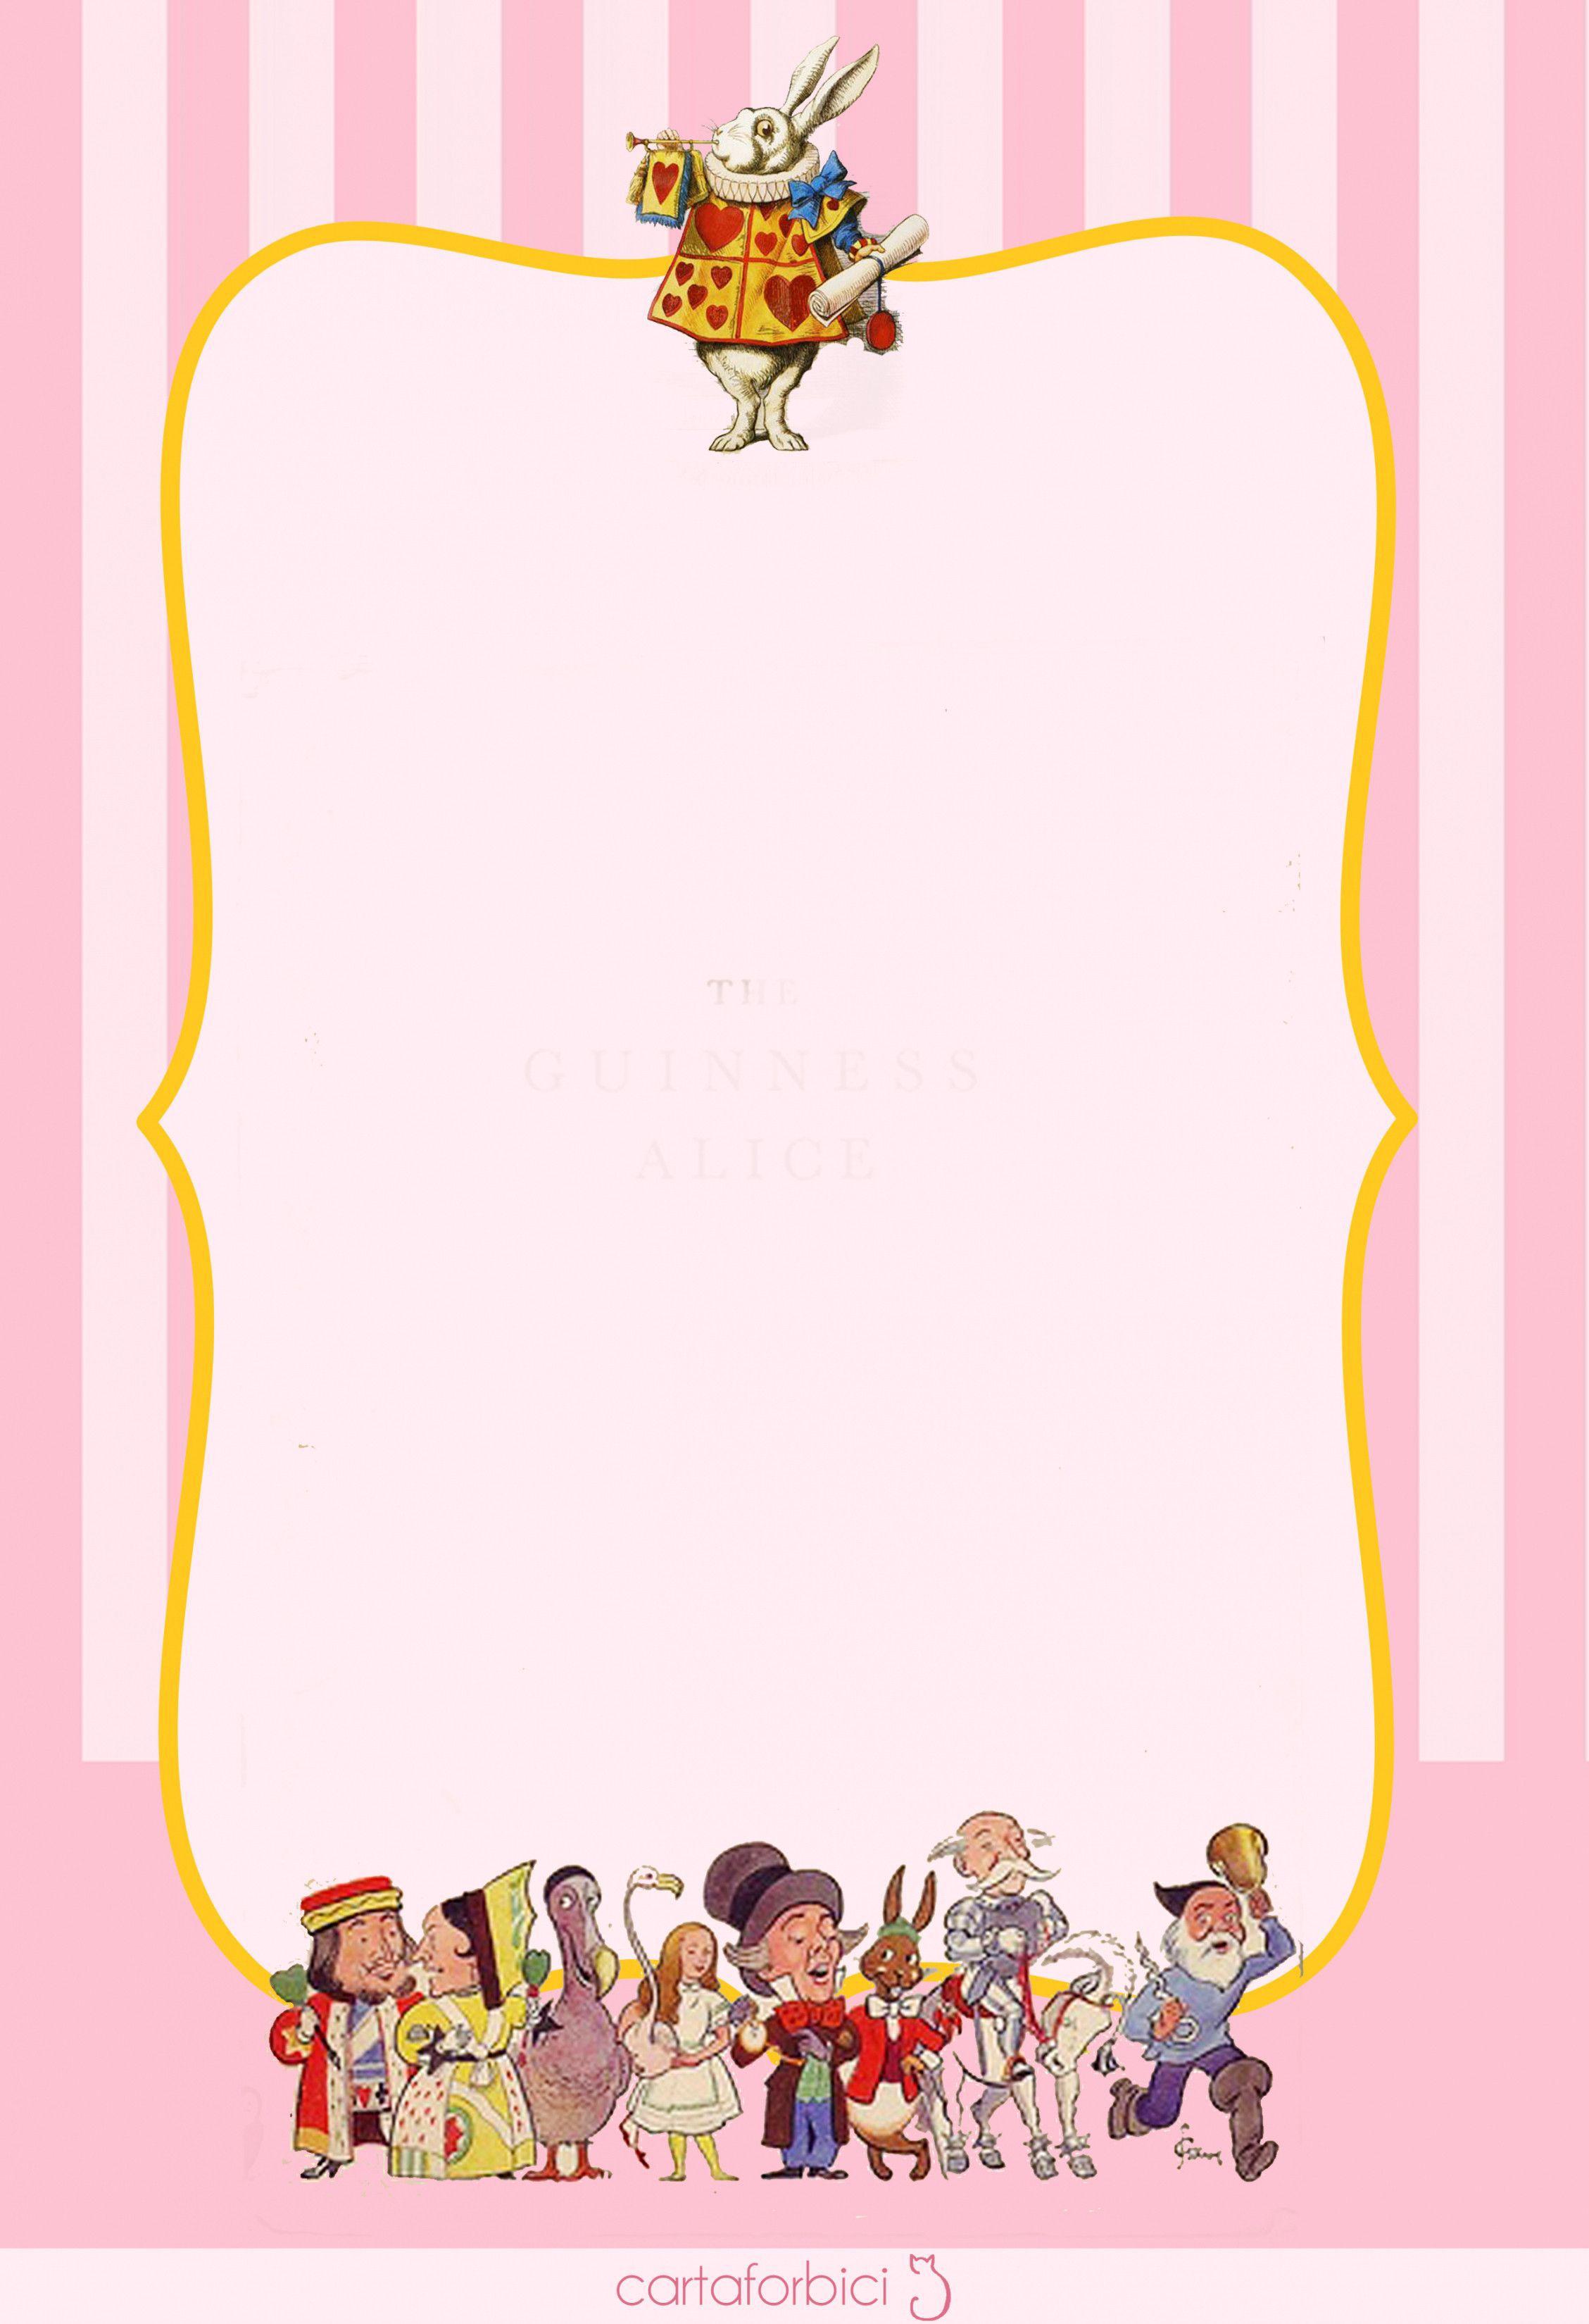 000 Surprising Alice In Wonderland Invite Template High Resolution  Party Invitation FreeFull